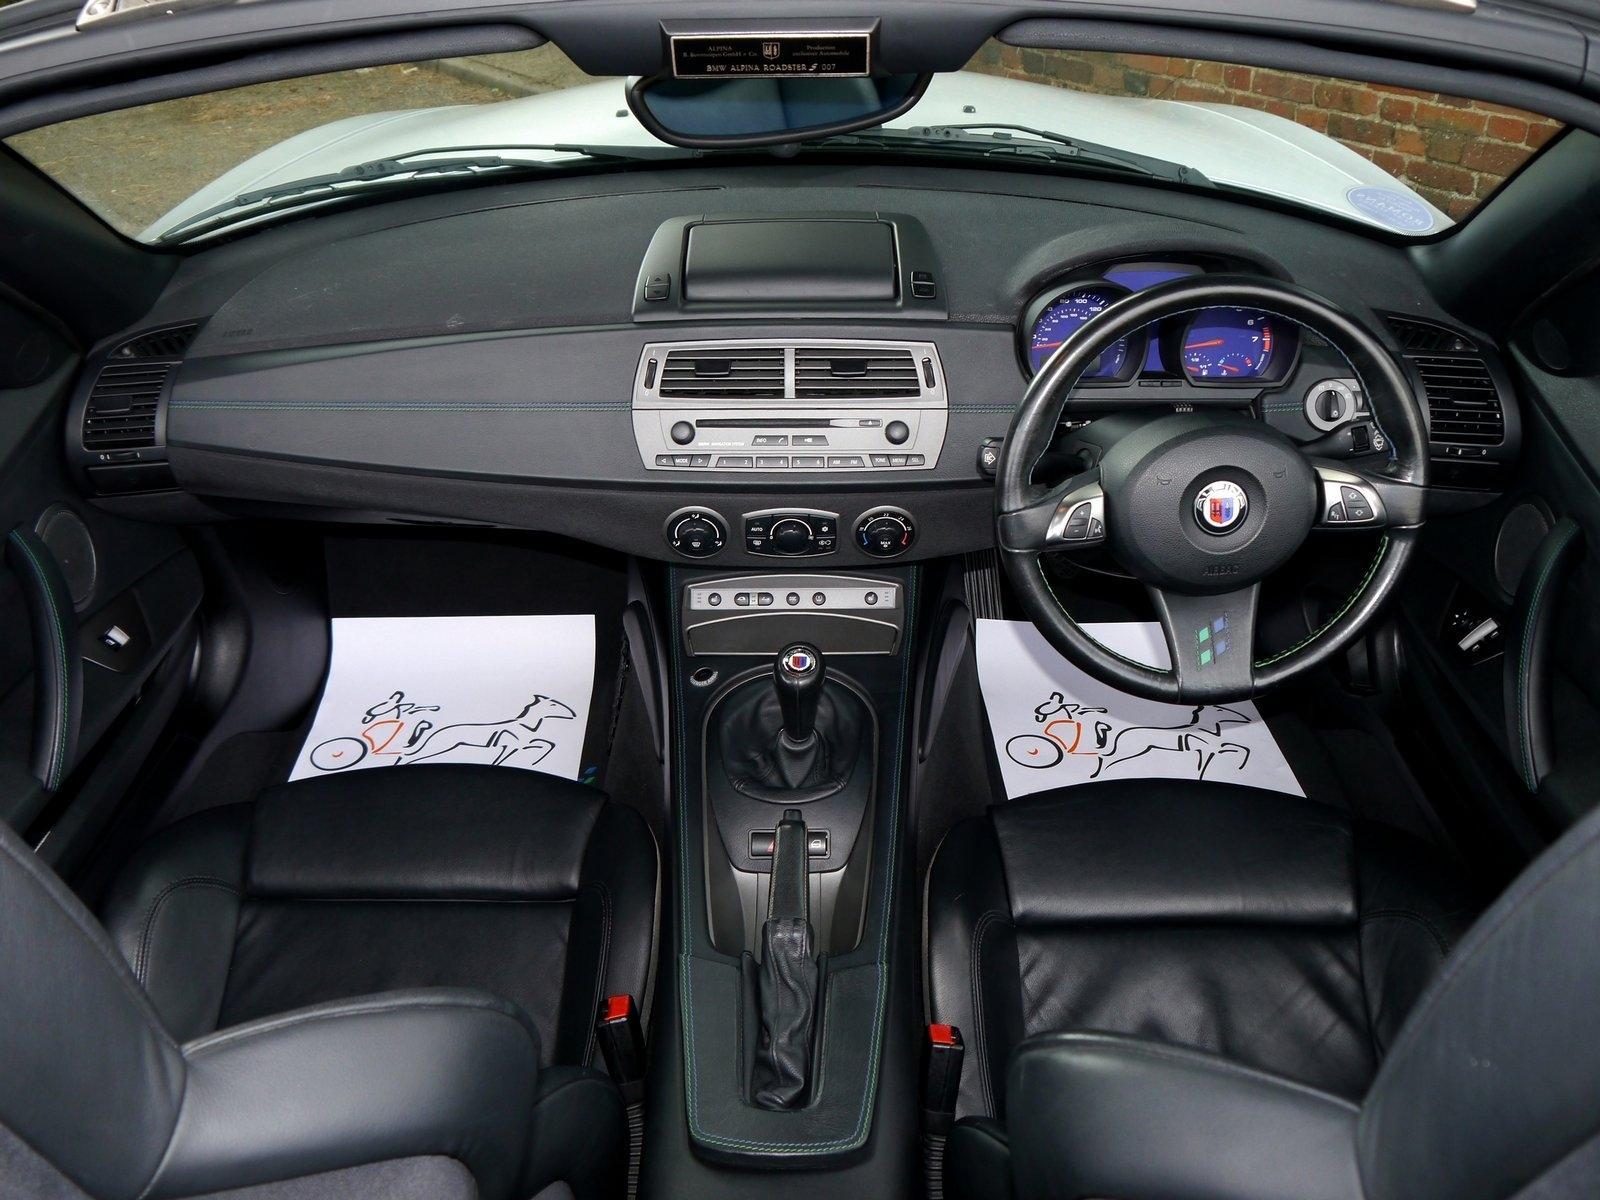 BMWALPINA ROADSTER 3.4 S LUX - RARE VEHICLE - BMW FSH #9